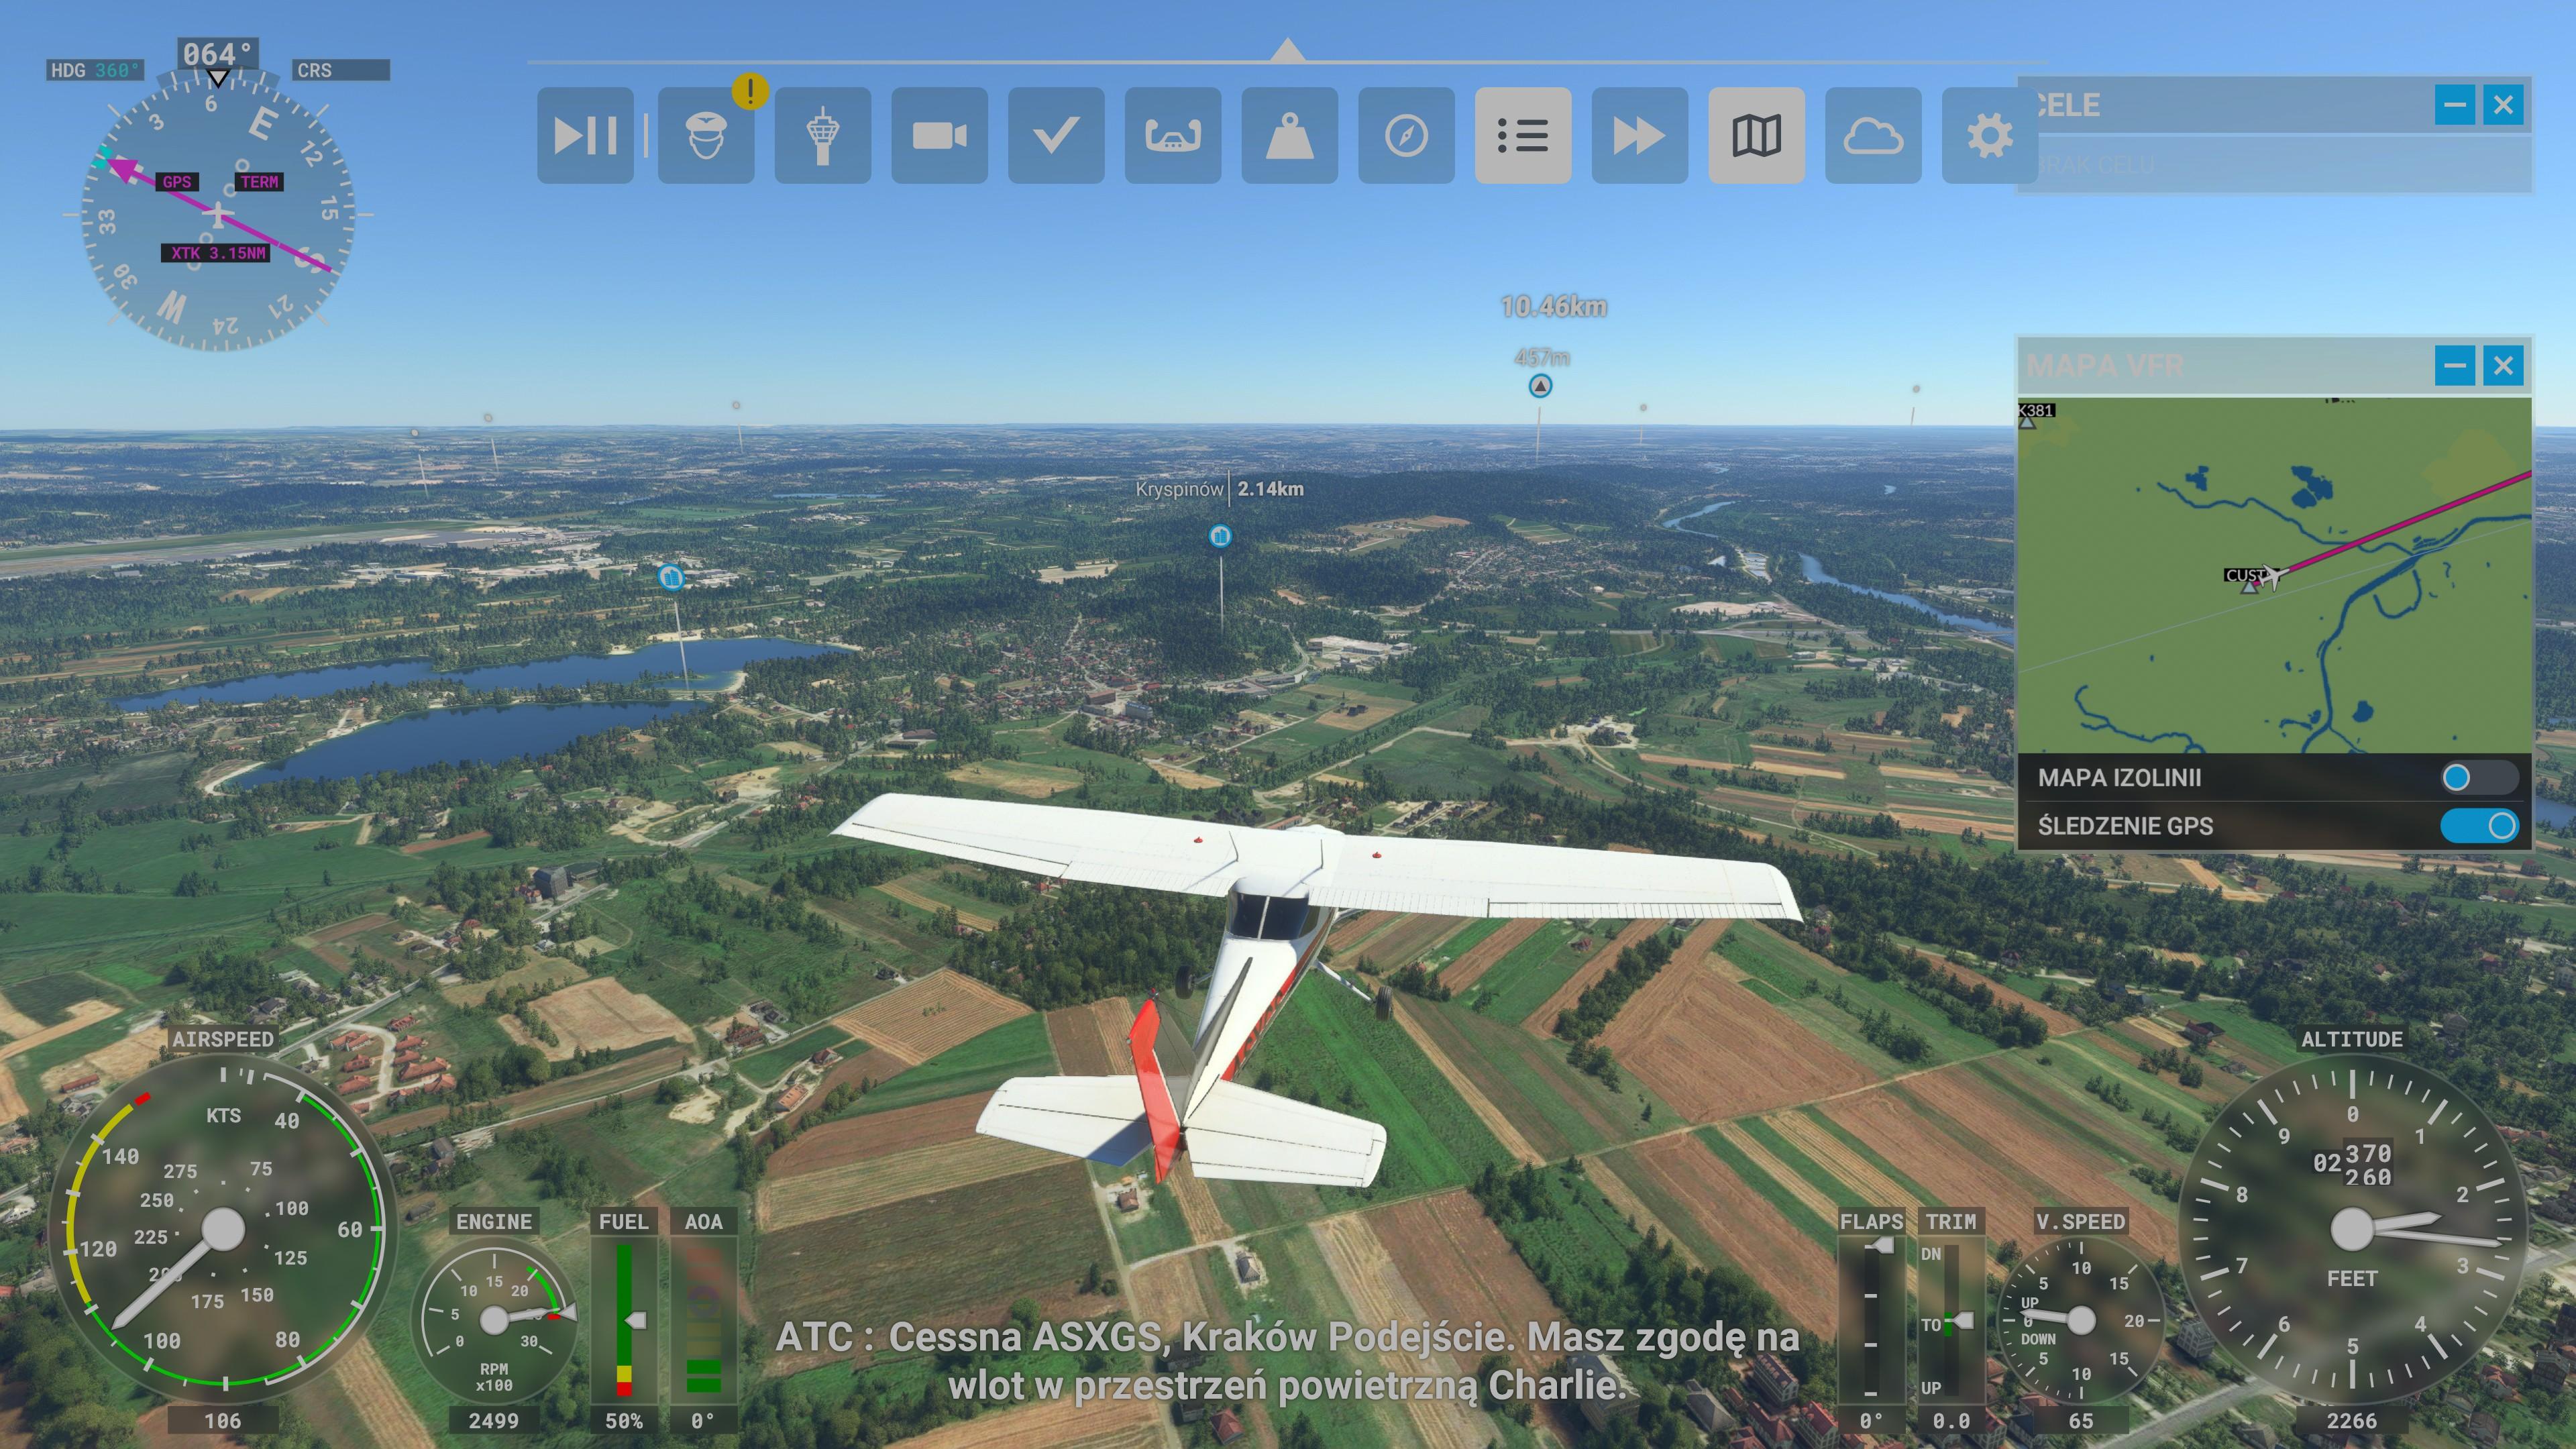 Recenzja Microsoft Flight Simulator na Xbox - fot. Tabletowo.pl